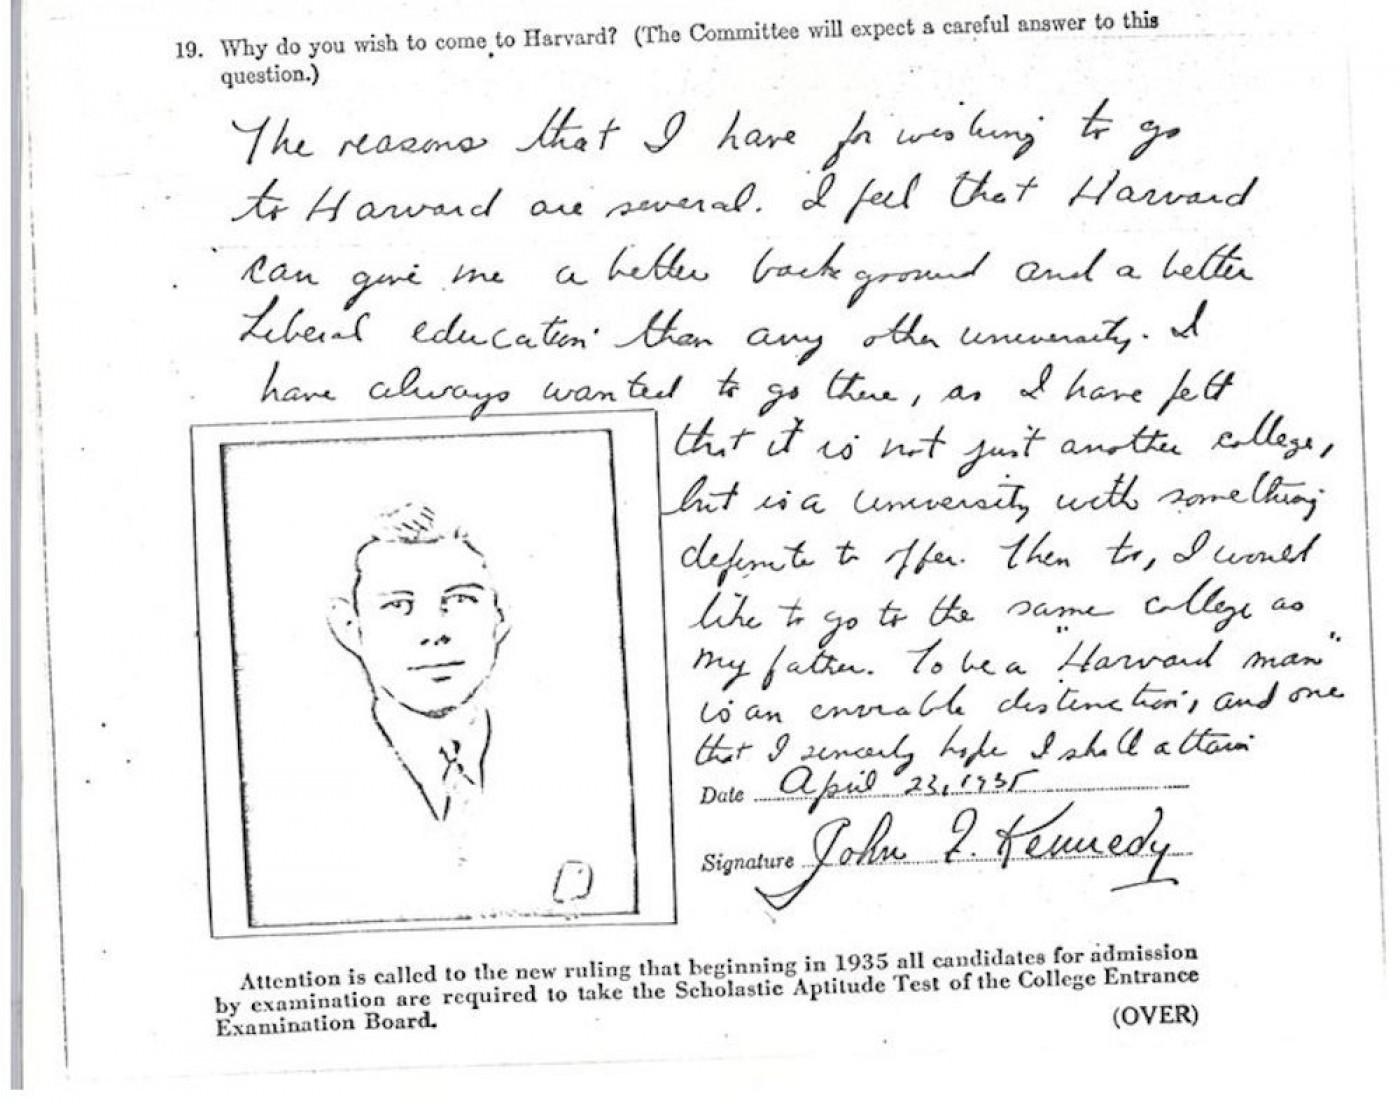 007 Essay Example Harvard Acceptance Essays John Kennedy Jfk University Application Frightening 50 Successful Pdf Free 2017 3rd Edition 1400